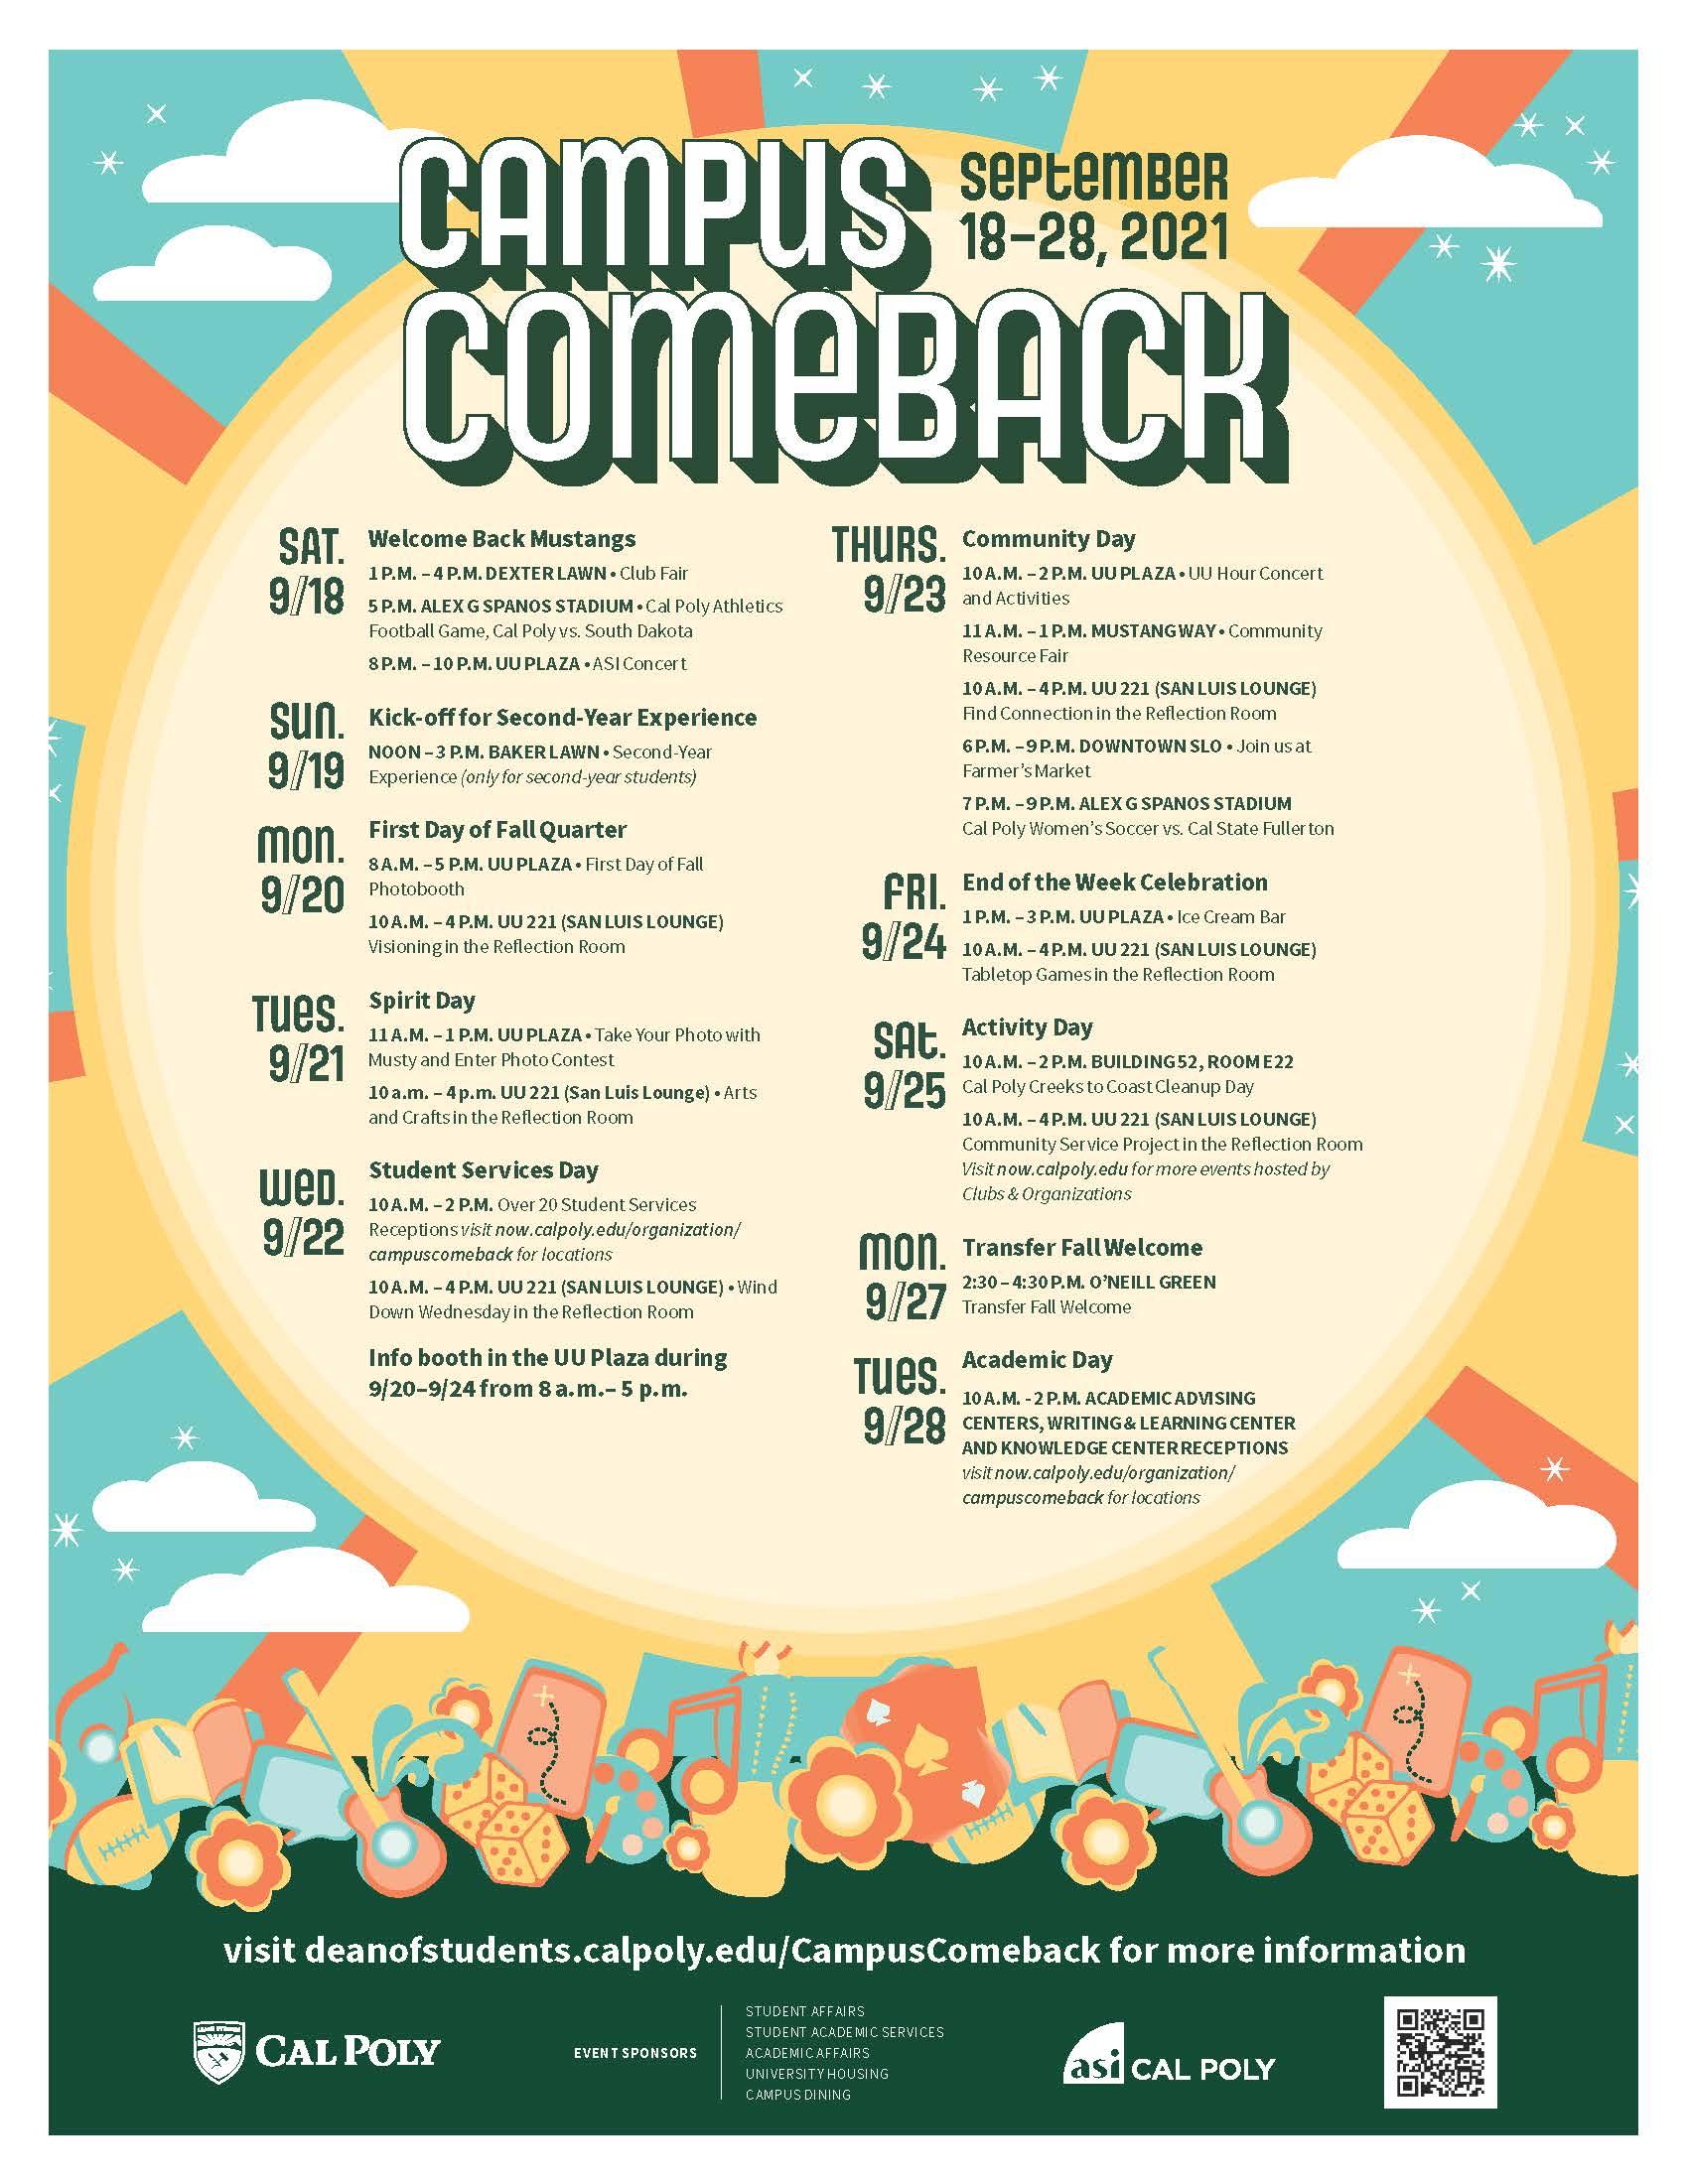 Campus Comeback schedule - click to download PDF